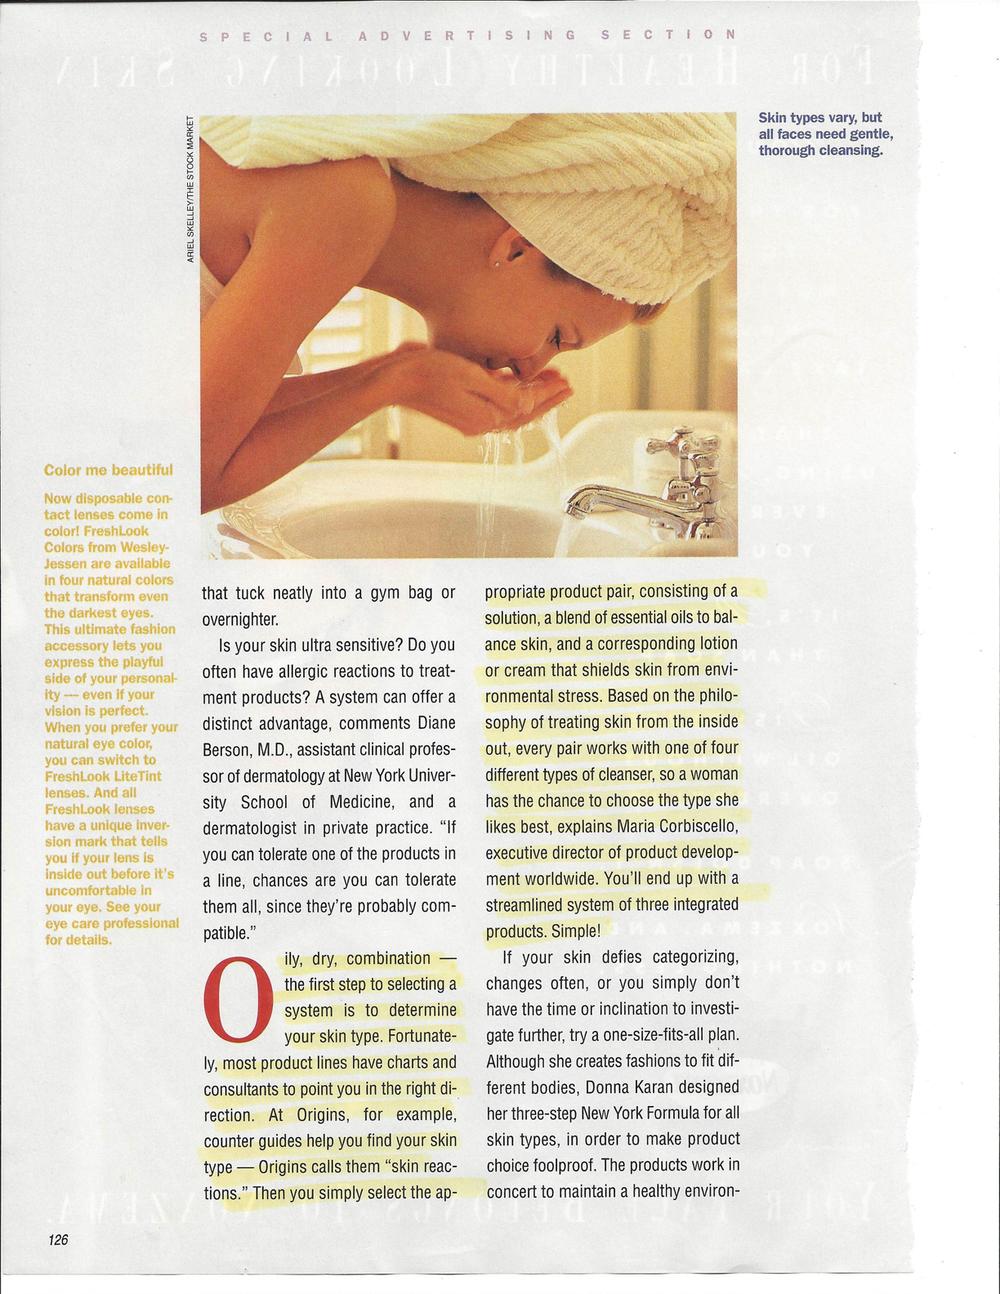 Cosmopolitan article 2.jpg